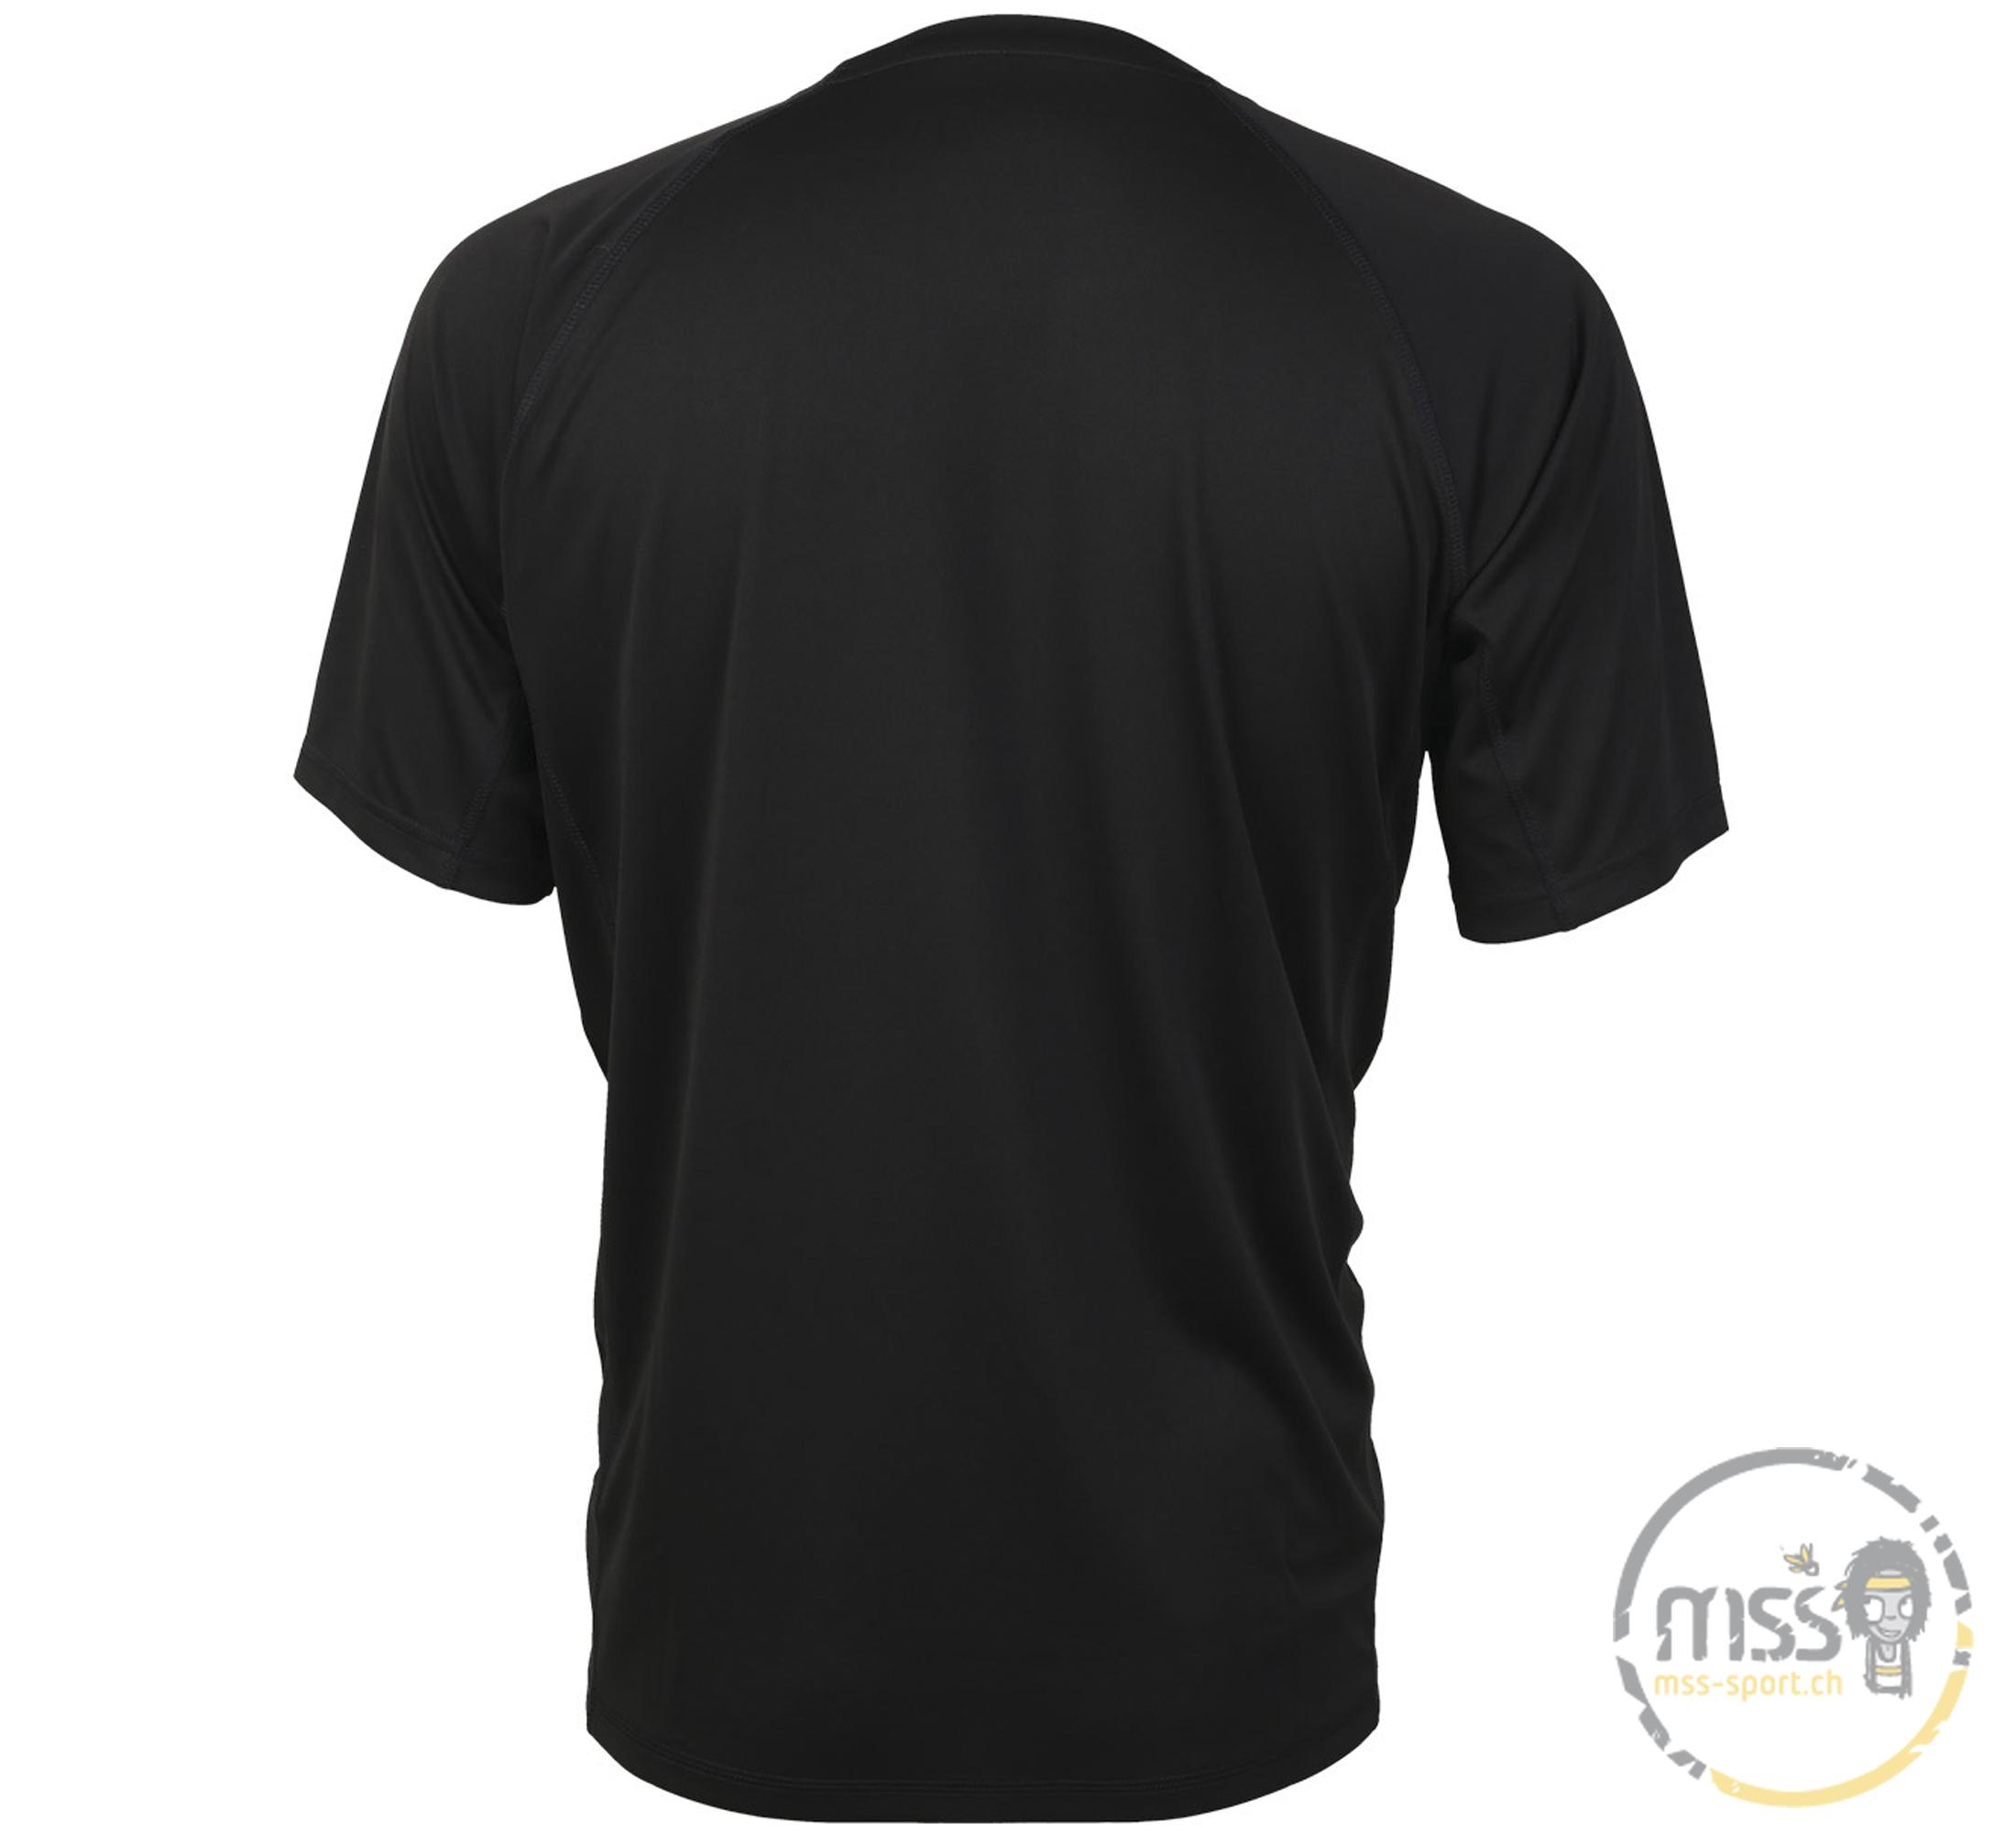 Forza Shirt Bling Tee black